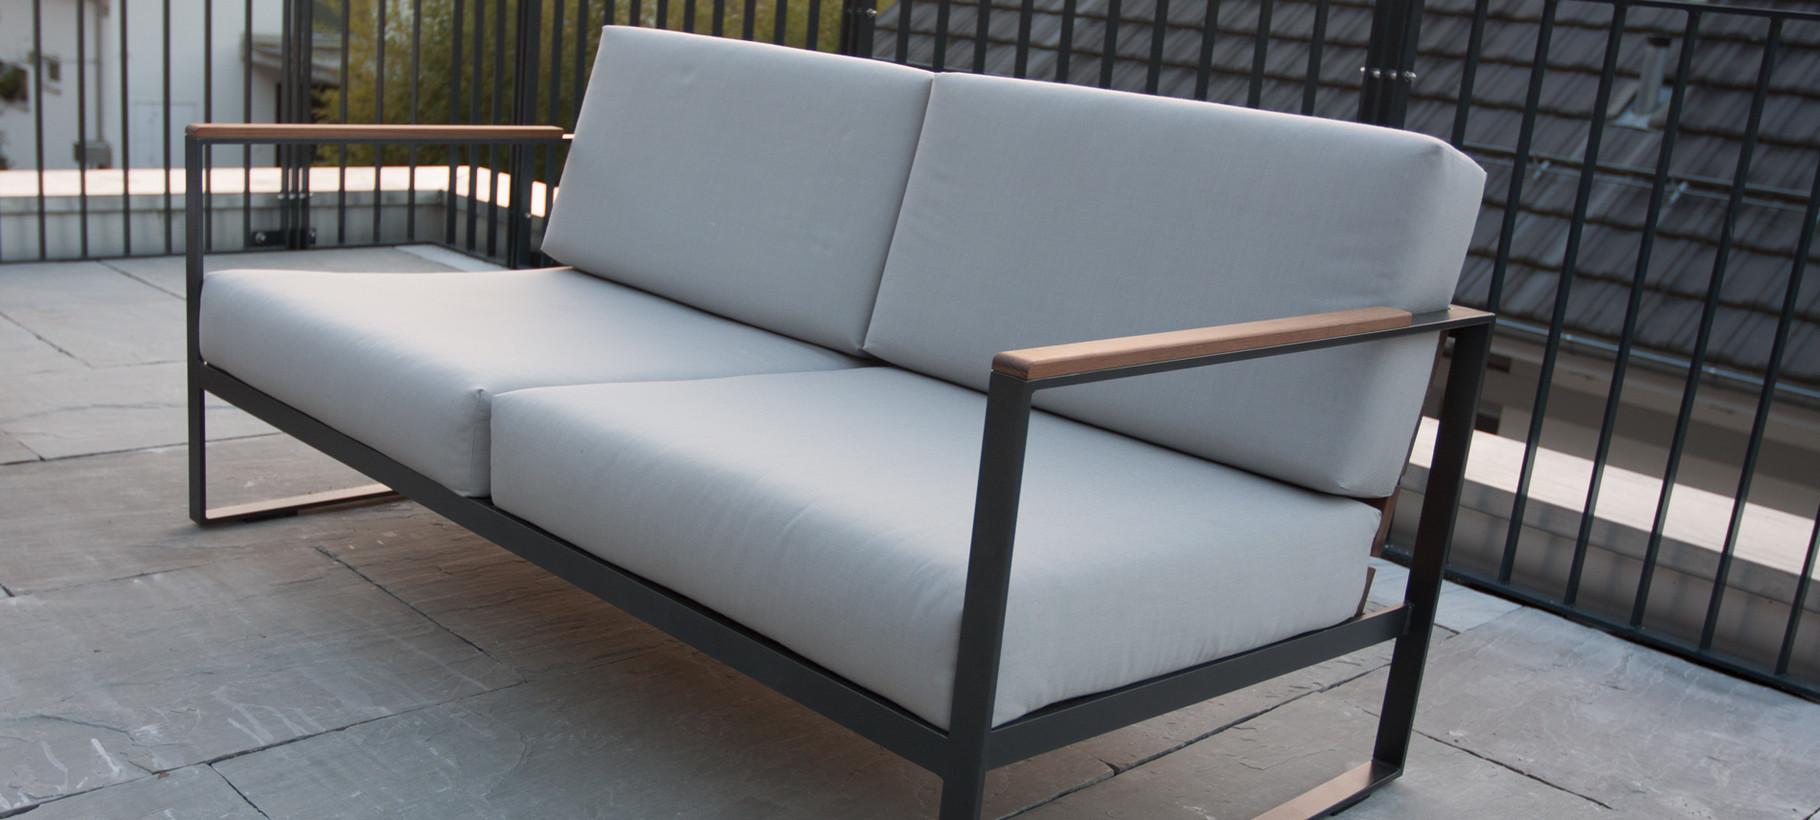 Design metall lounge gartenm bel gartenlounge schweiz for Lounge mobel garten